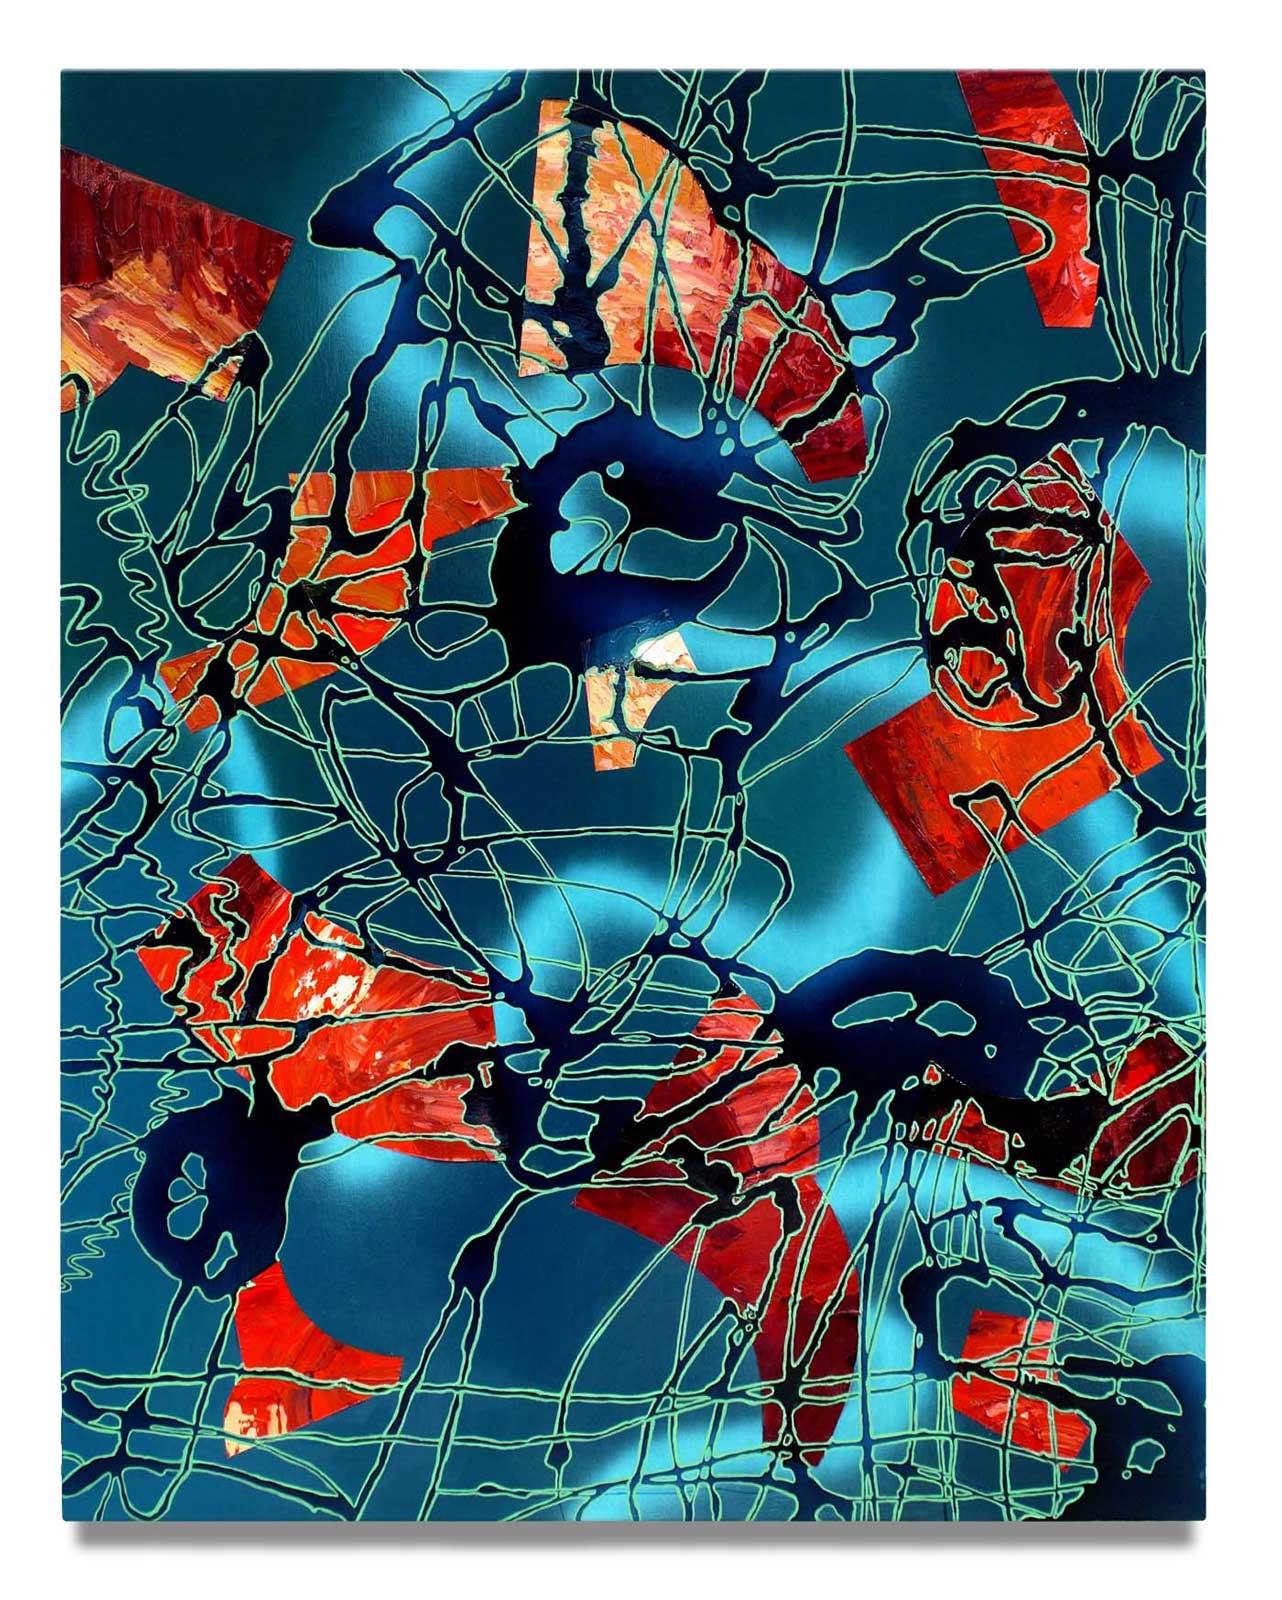 Loose Net - Oil on Canvas - 142.24 cm x 111.76 cm.